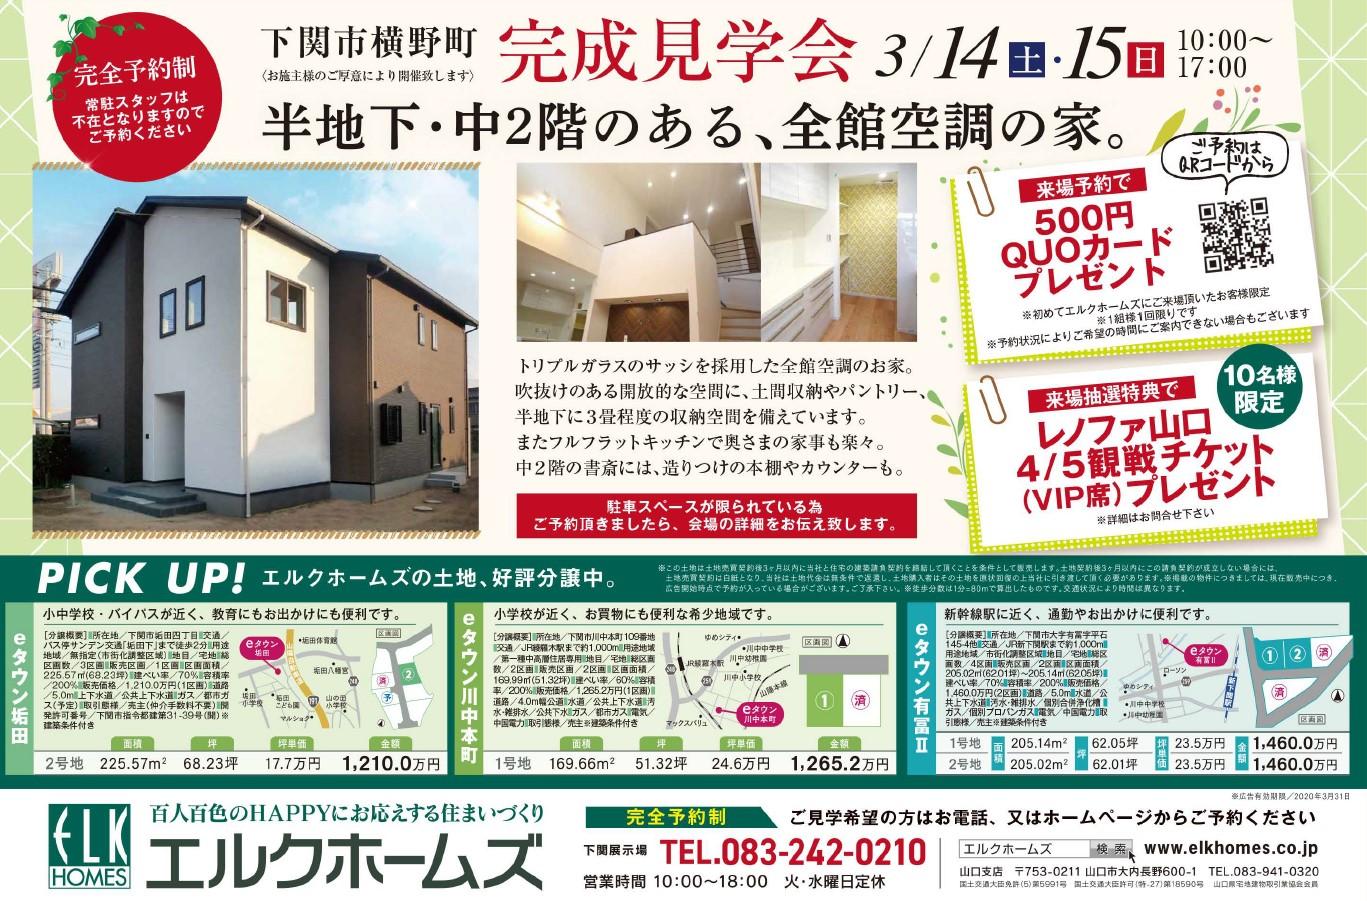 画像:3/14~15下関市横野町にて完成見学会開催!